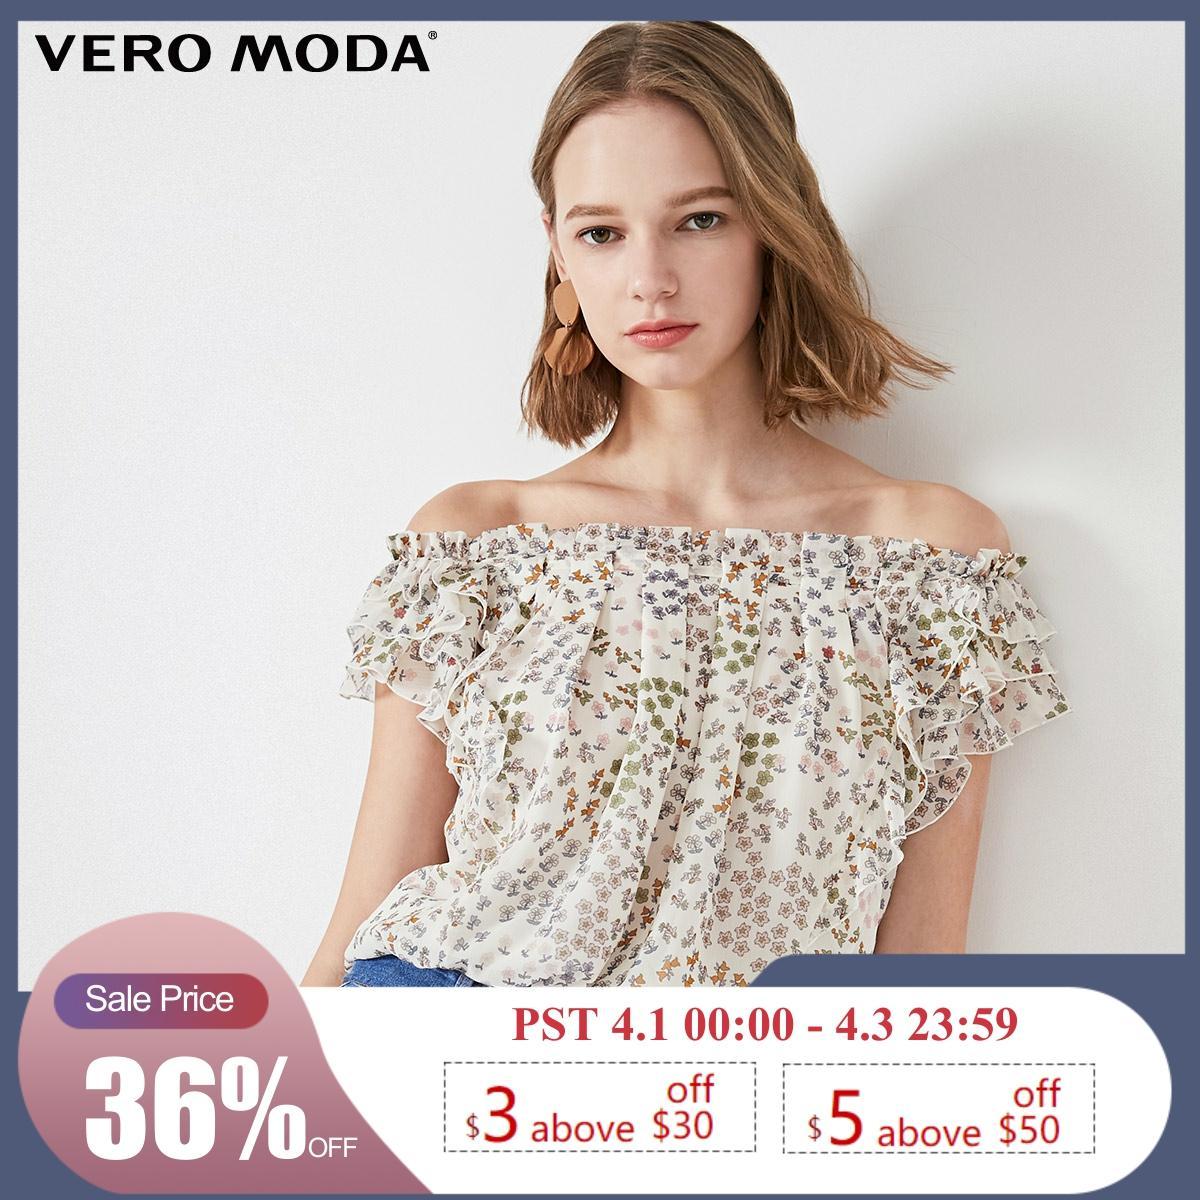 Vero Moda Women's Floral Ruffled Sleeves Elasticized Waist Tops Blouse | 319241520